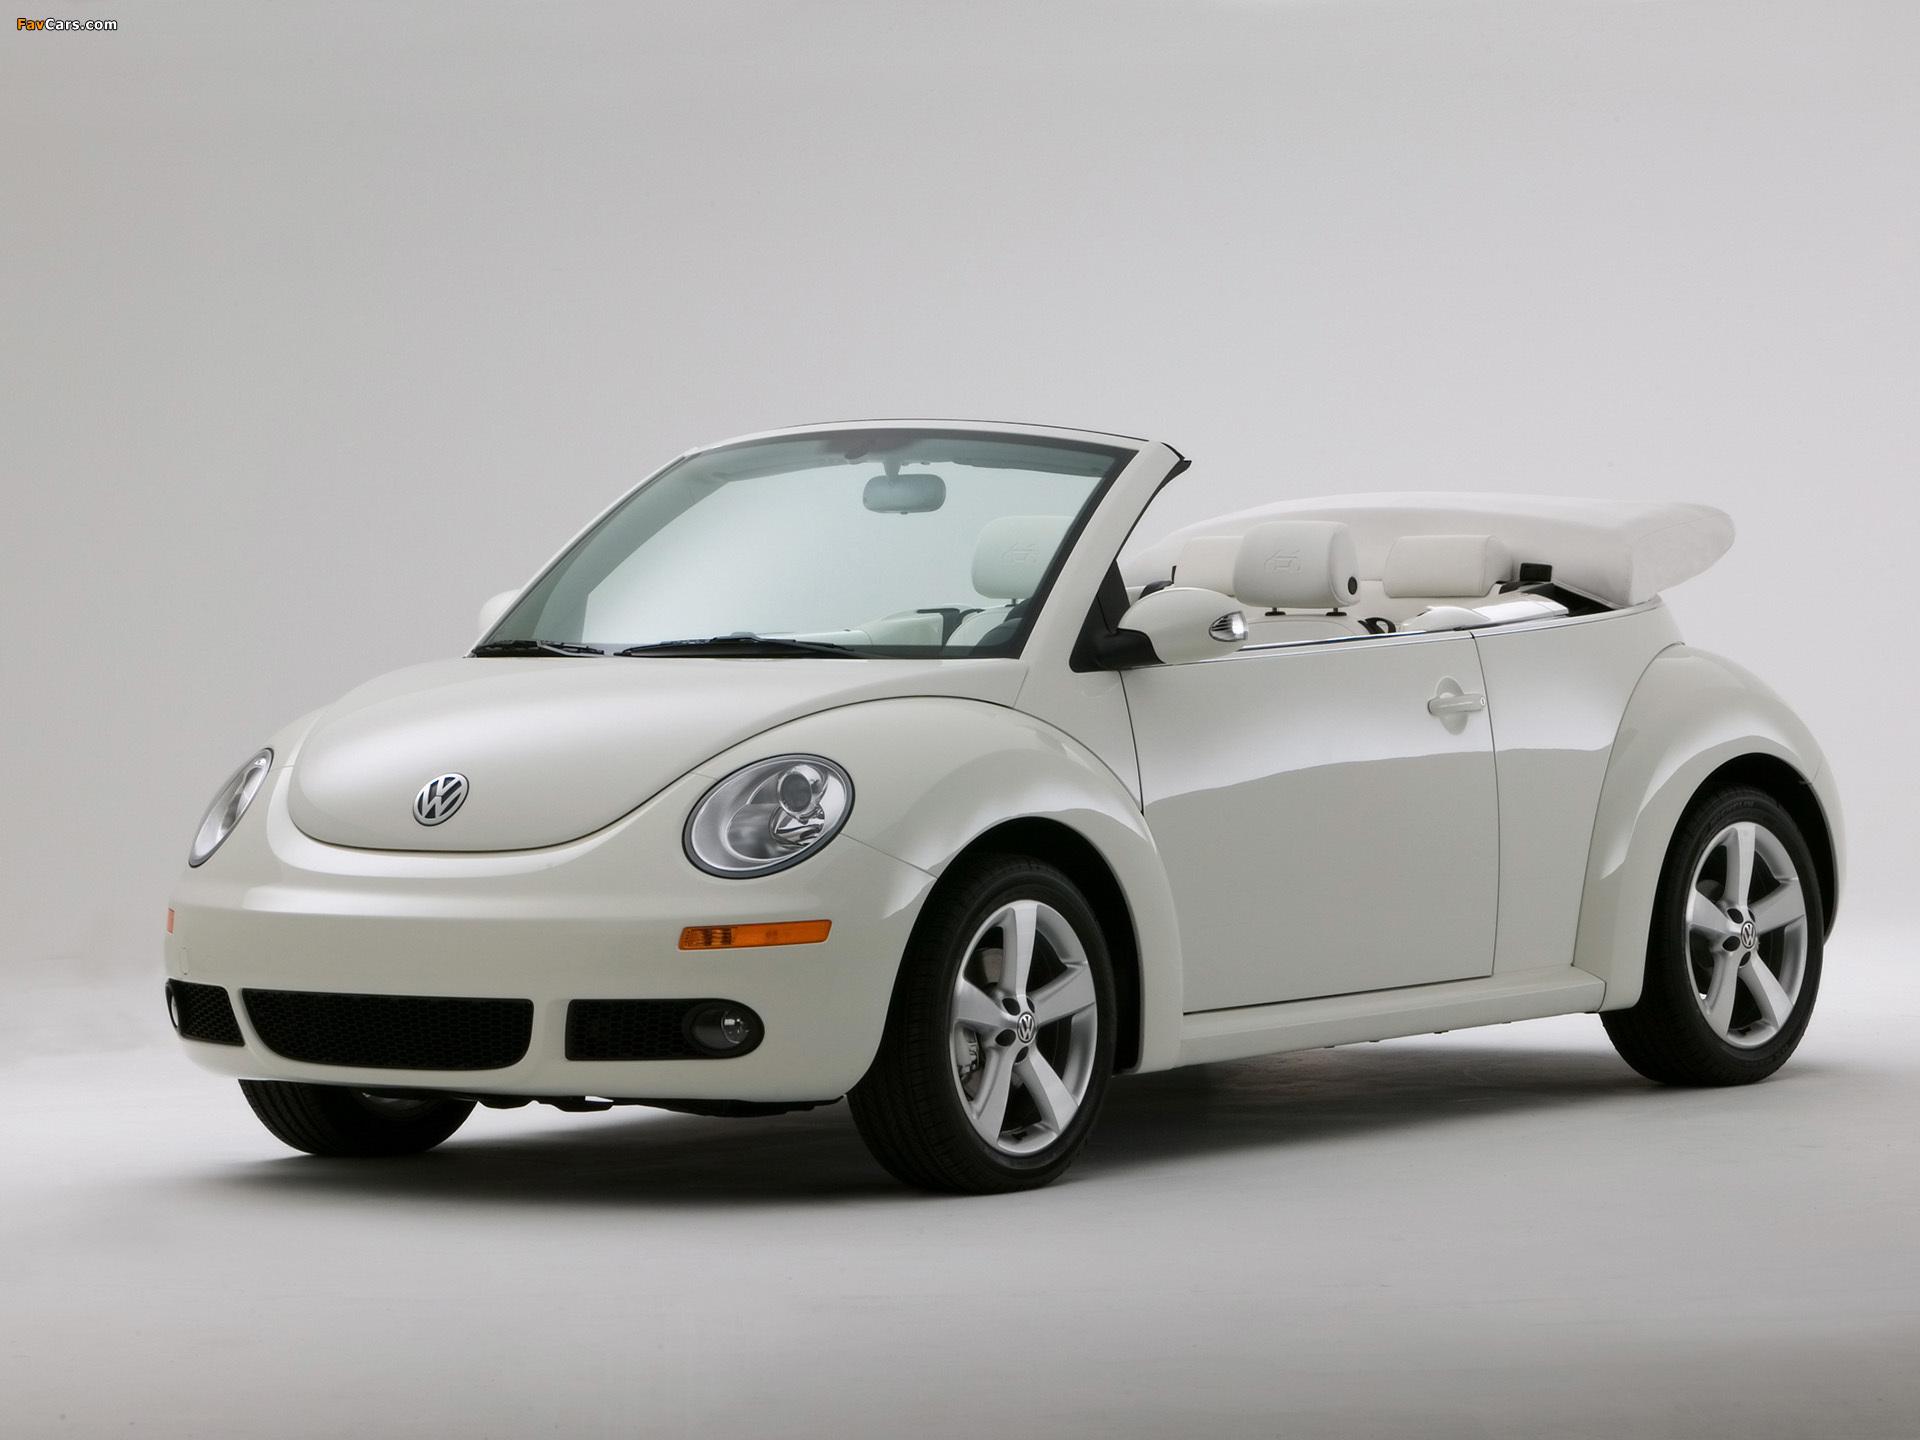 Volkswagen New Beetle Convertible Triple White 2007 photos (1920 x 1440)